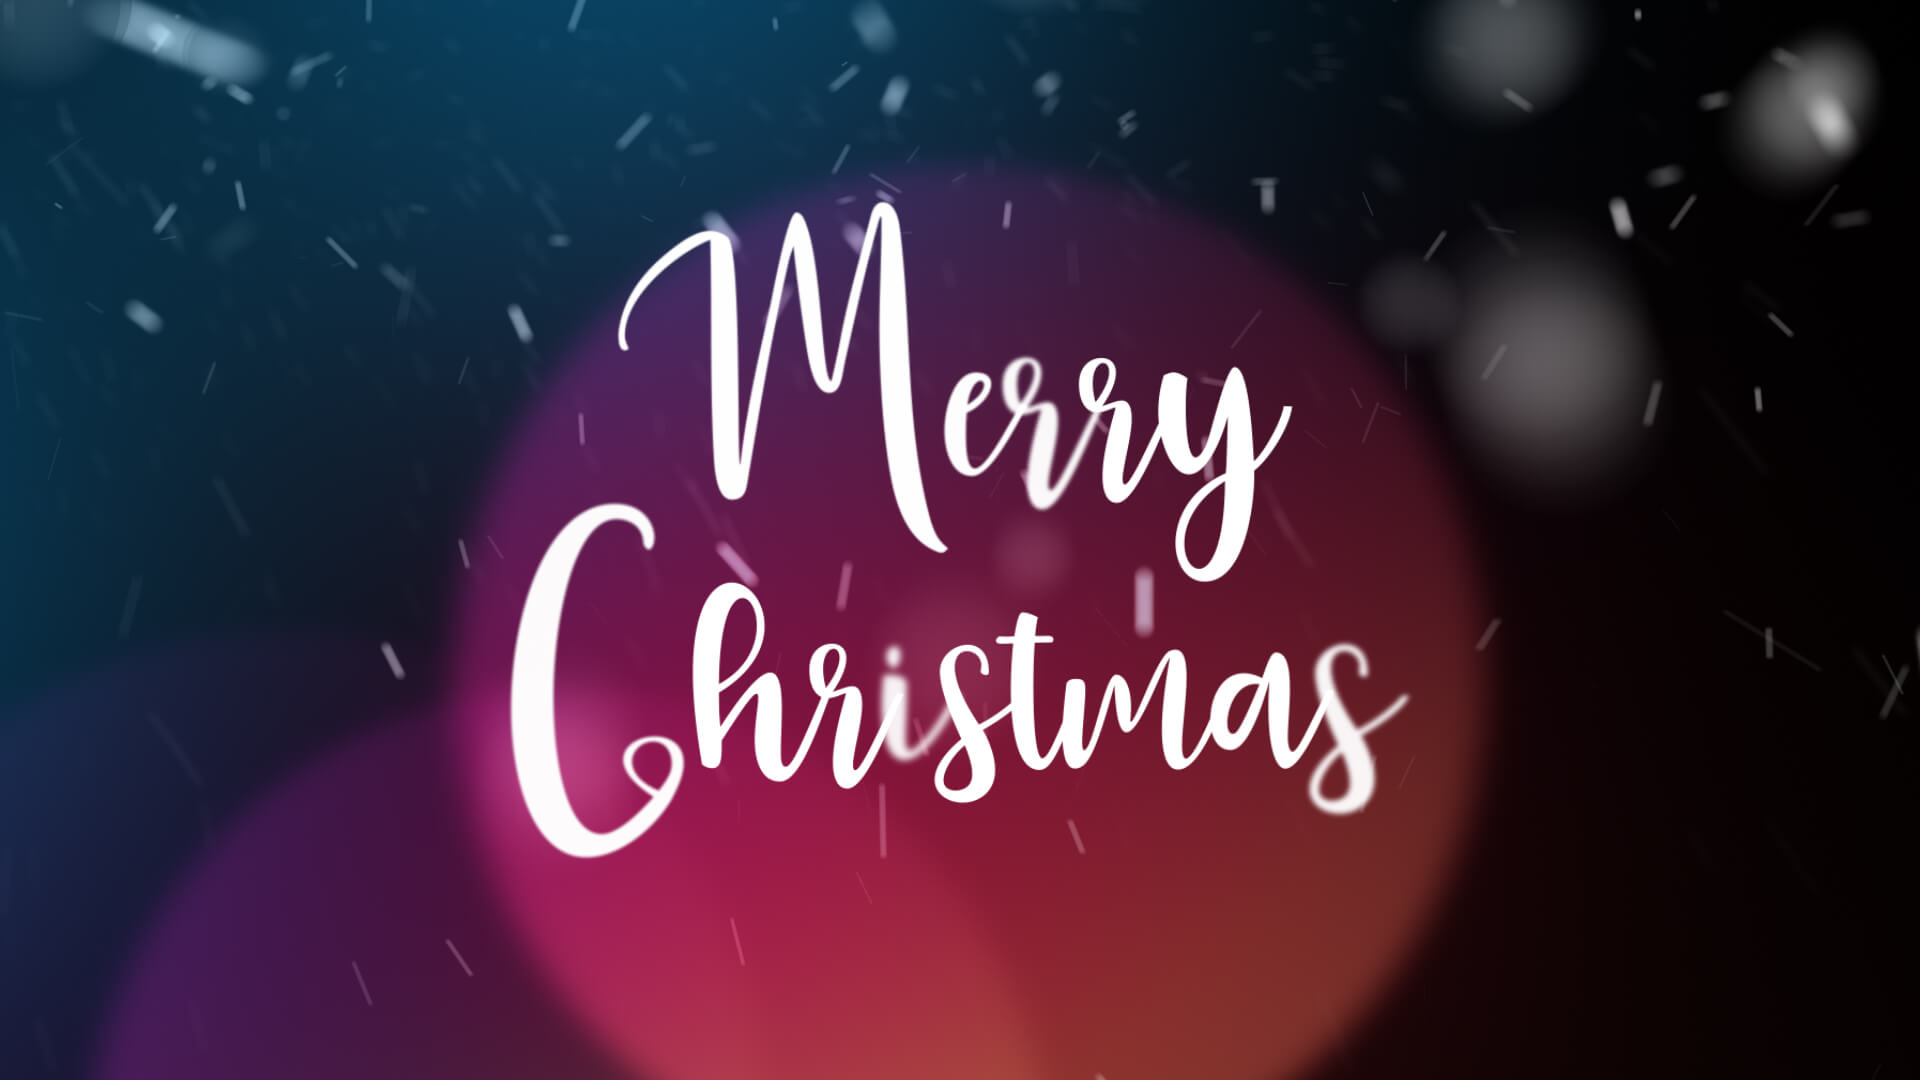 Merry Christmas Animation Video Still